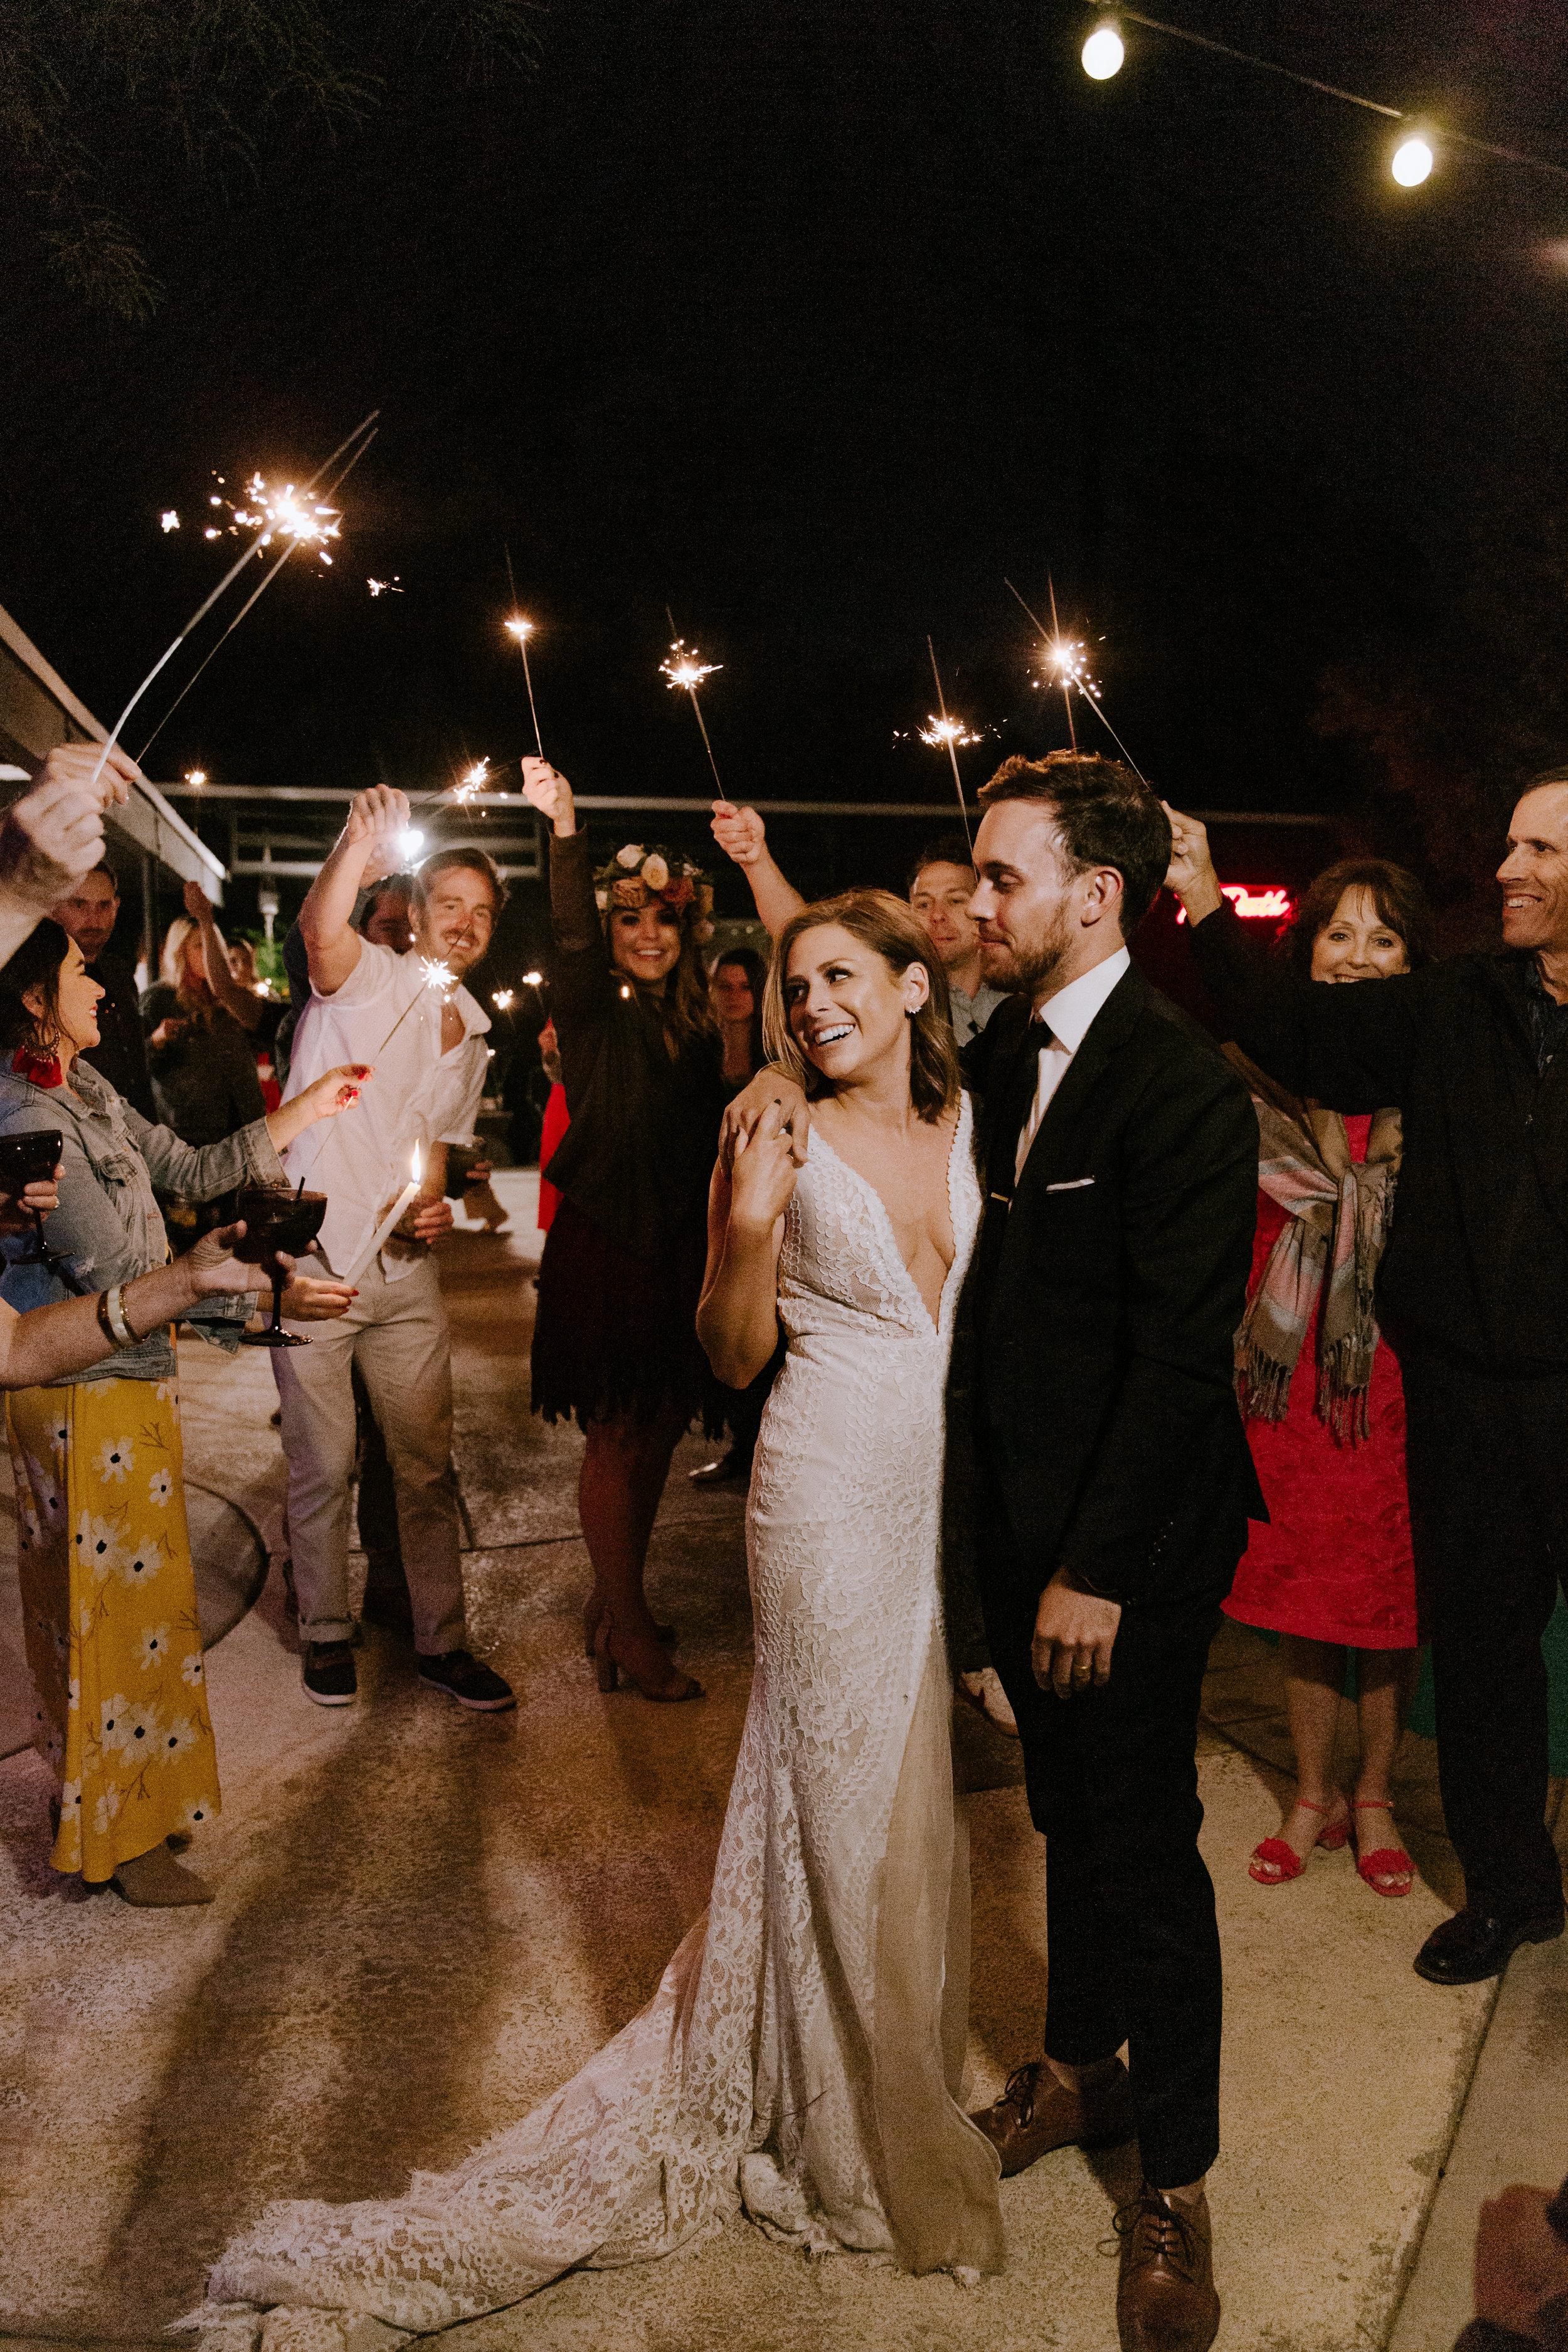 2019-05-26_Callie-Evan_Wedding_Joshua Tree_Paige Nelson_PREVIEWS HR-64.jpg